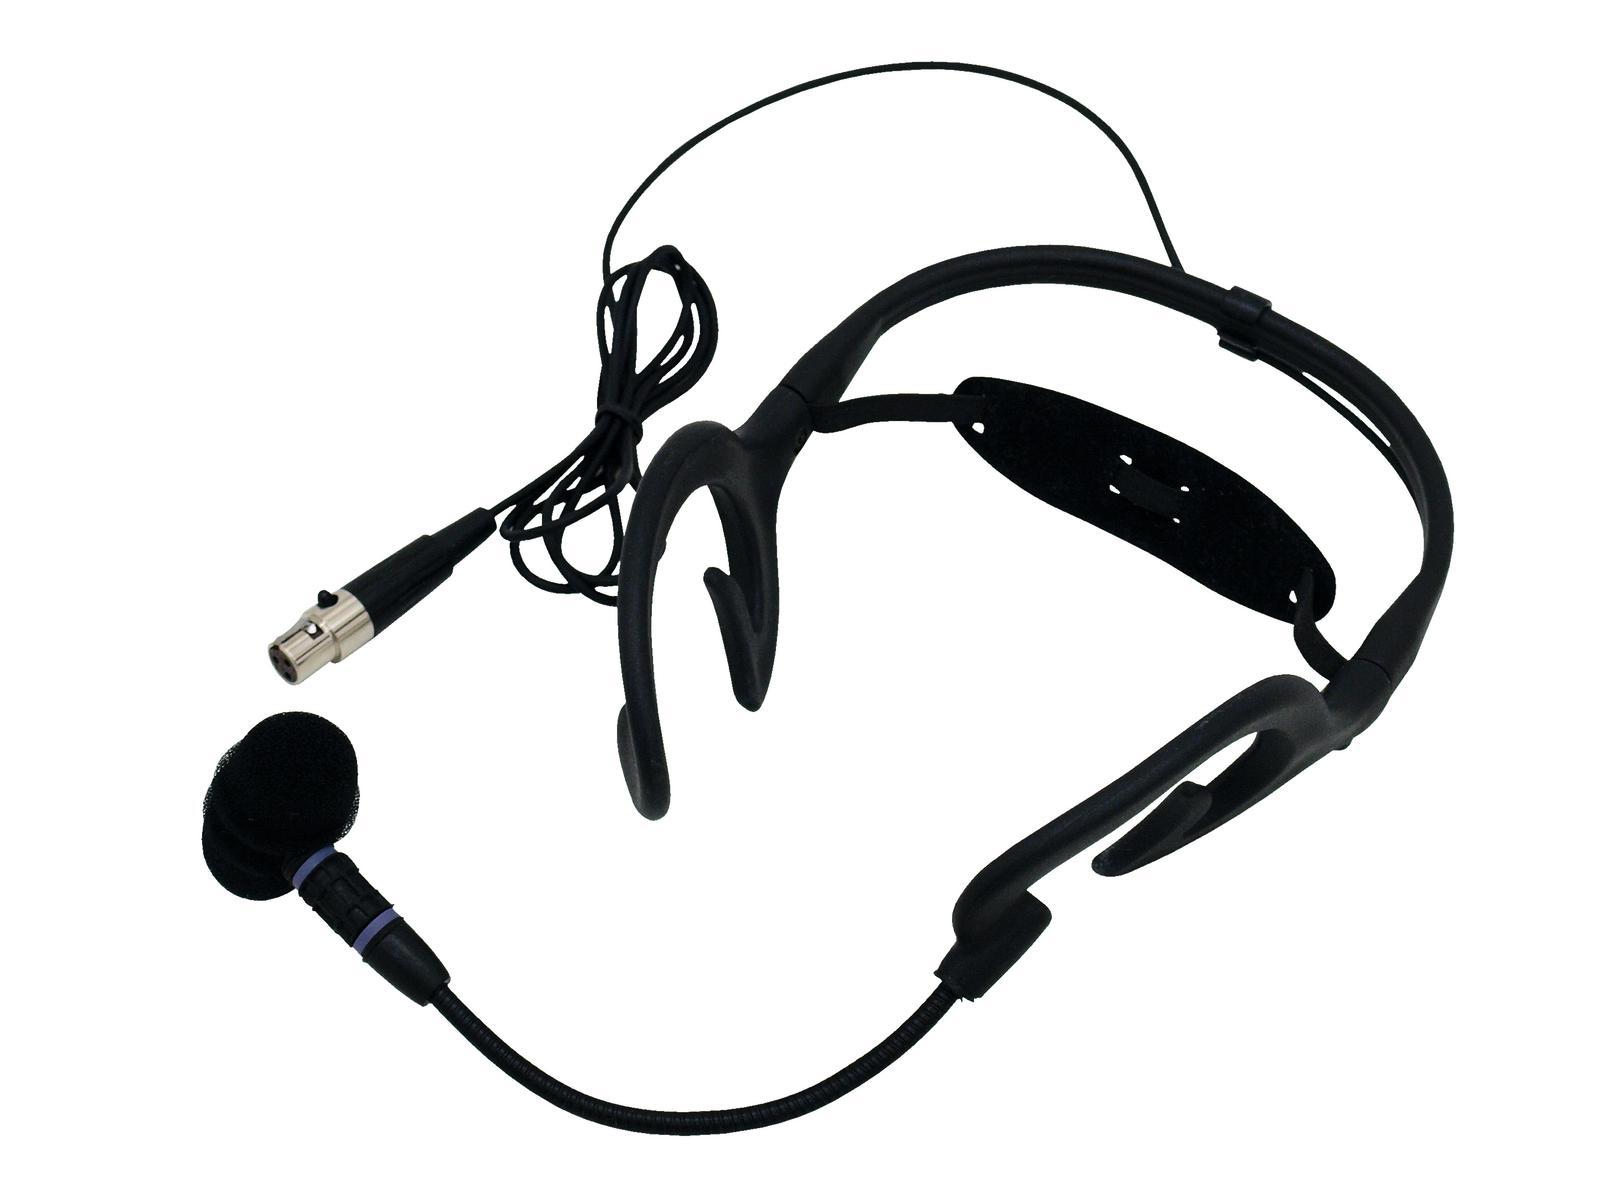 OMNITRONIC HS-1000 XLR microfono Arco Archetto